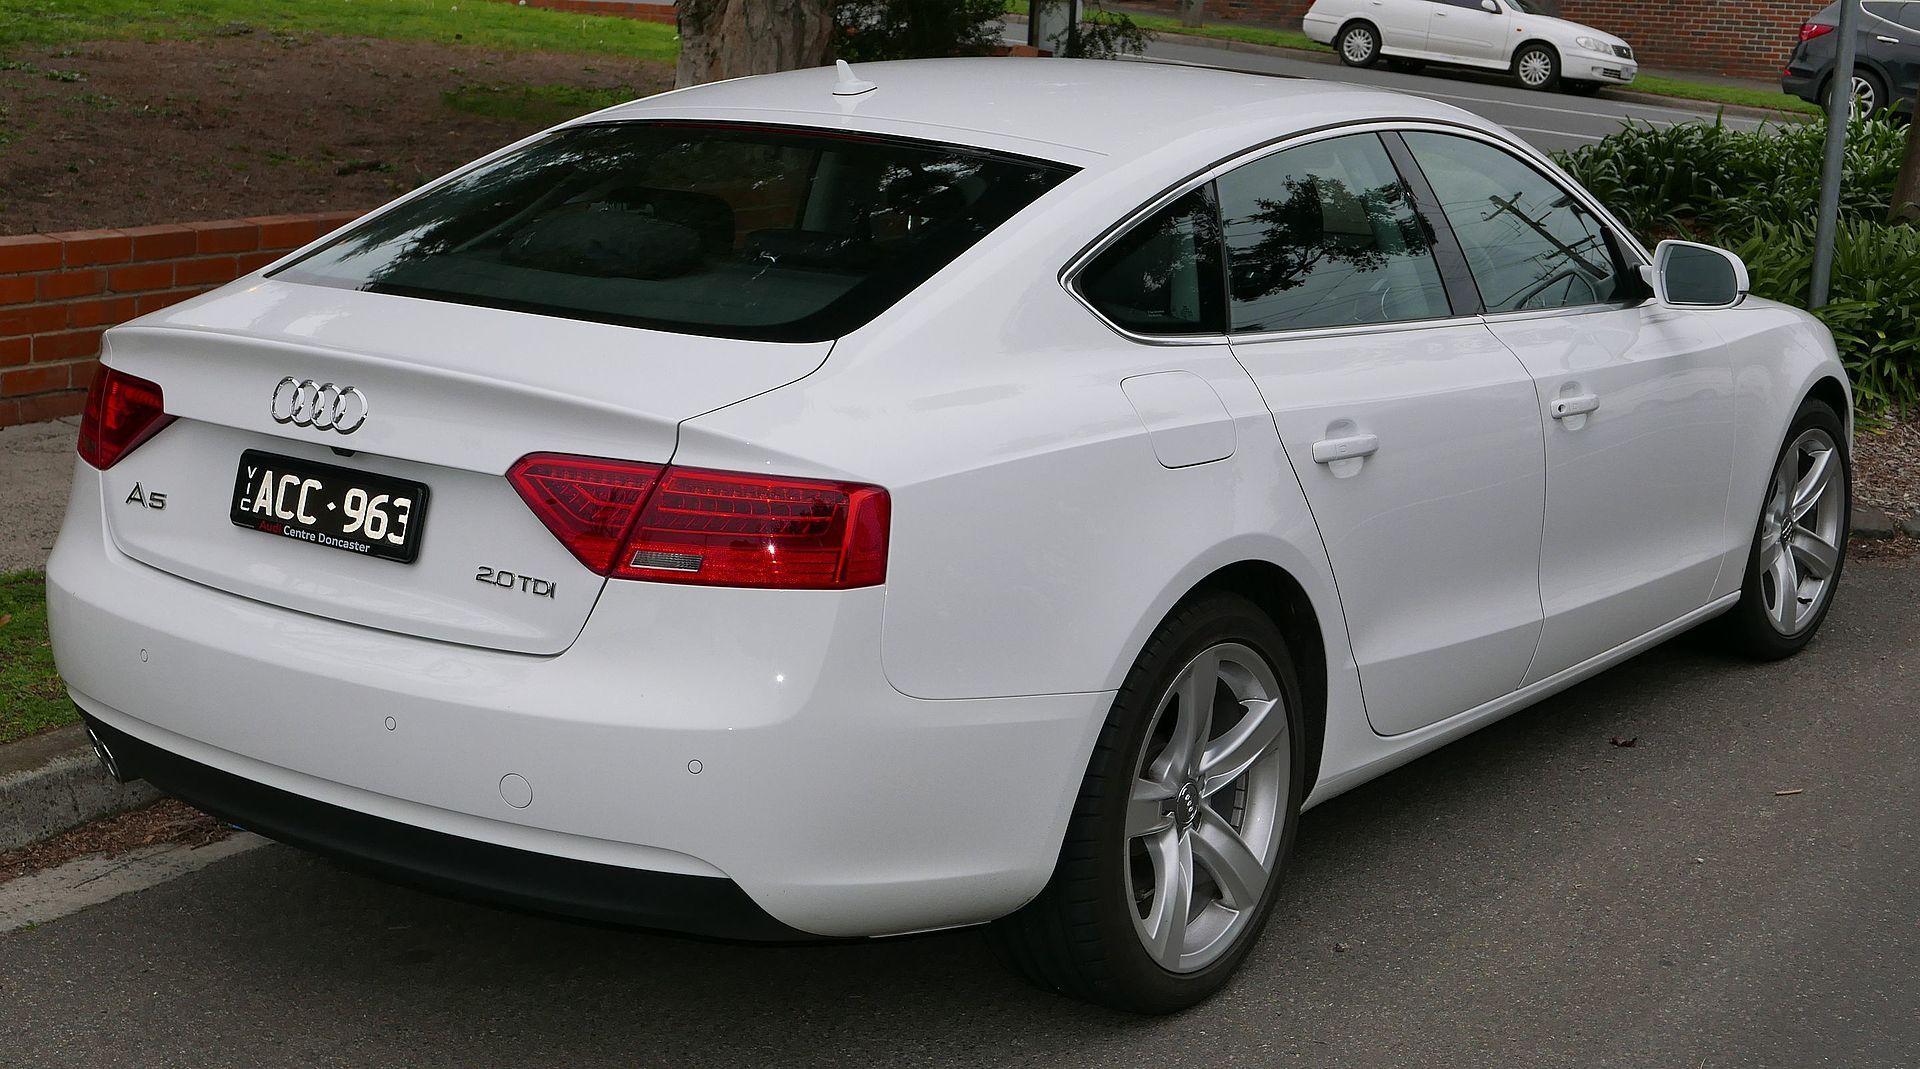 Kelebihan Audi A5 2014 Murah Berkualitas